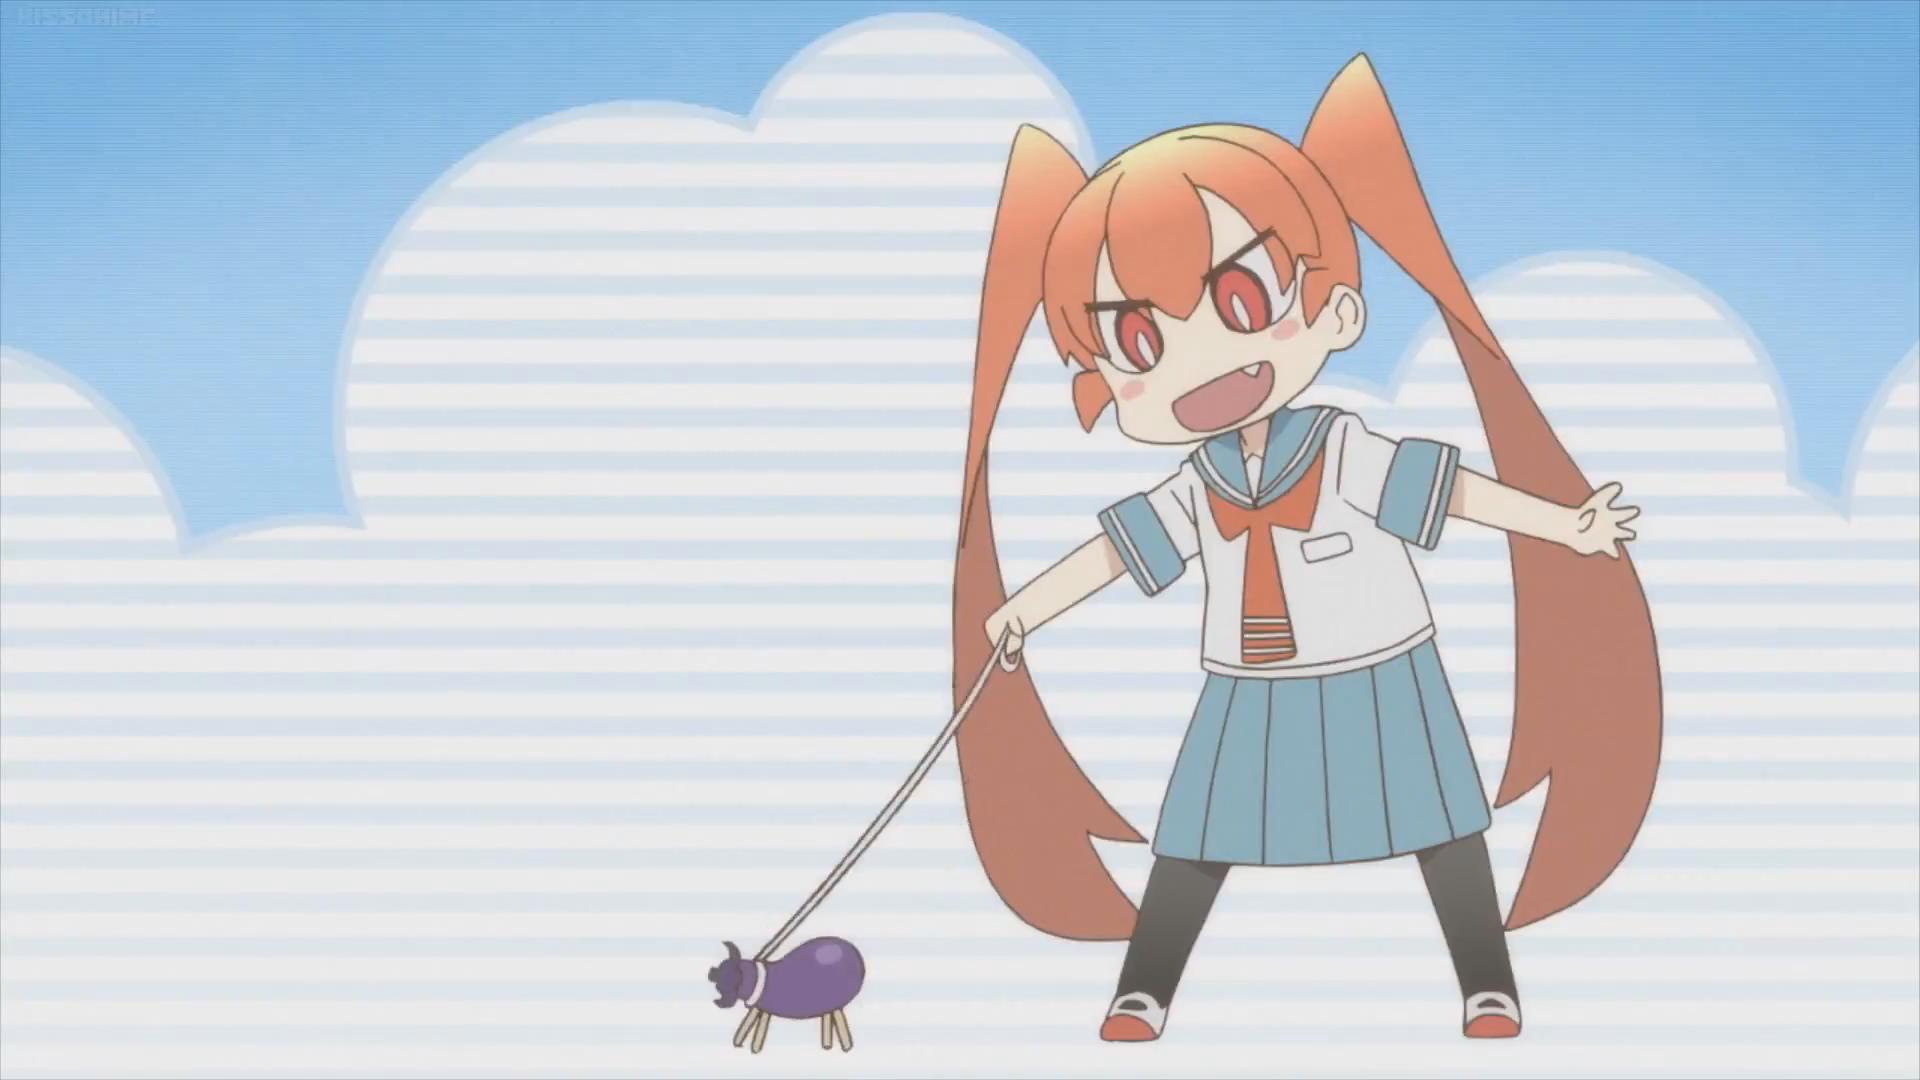 Anime Pop Sound 1/Image Gallery